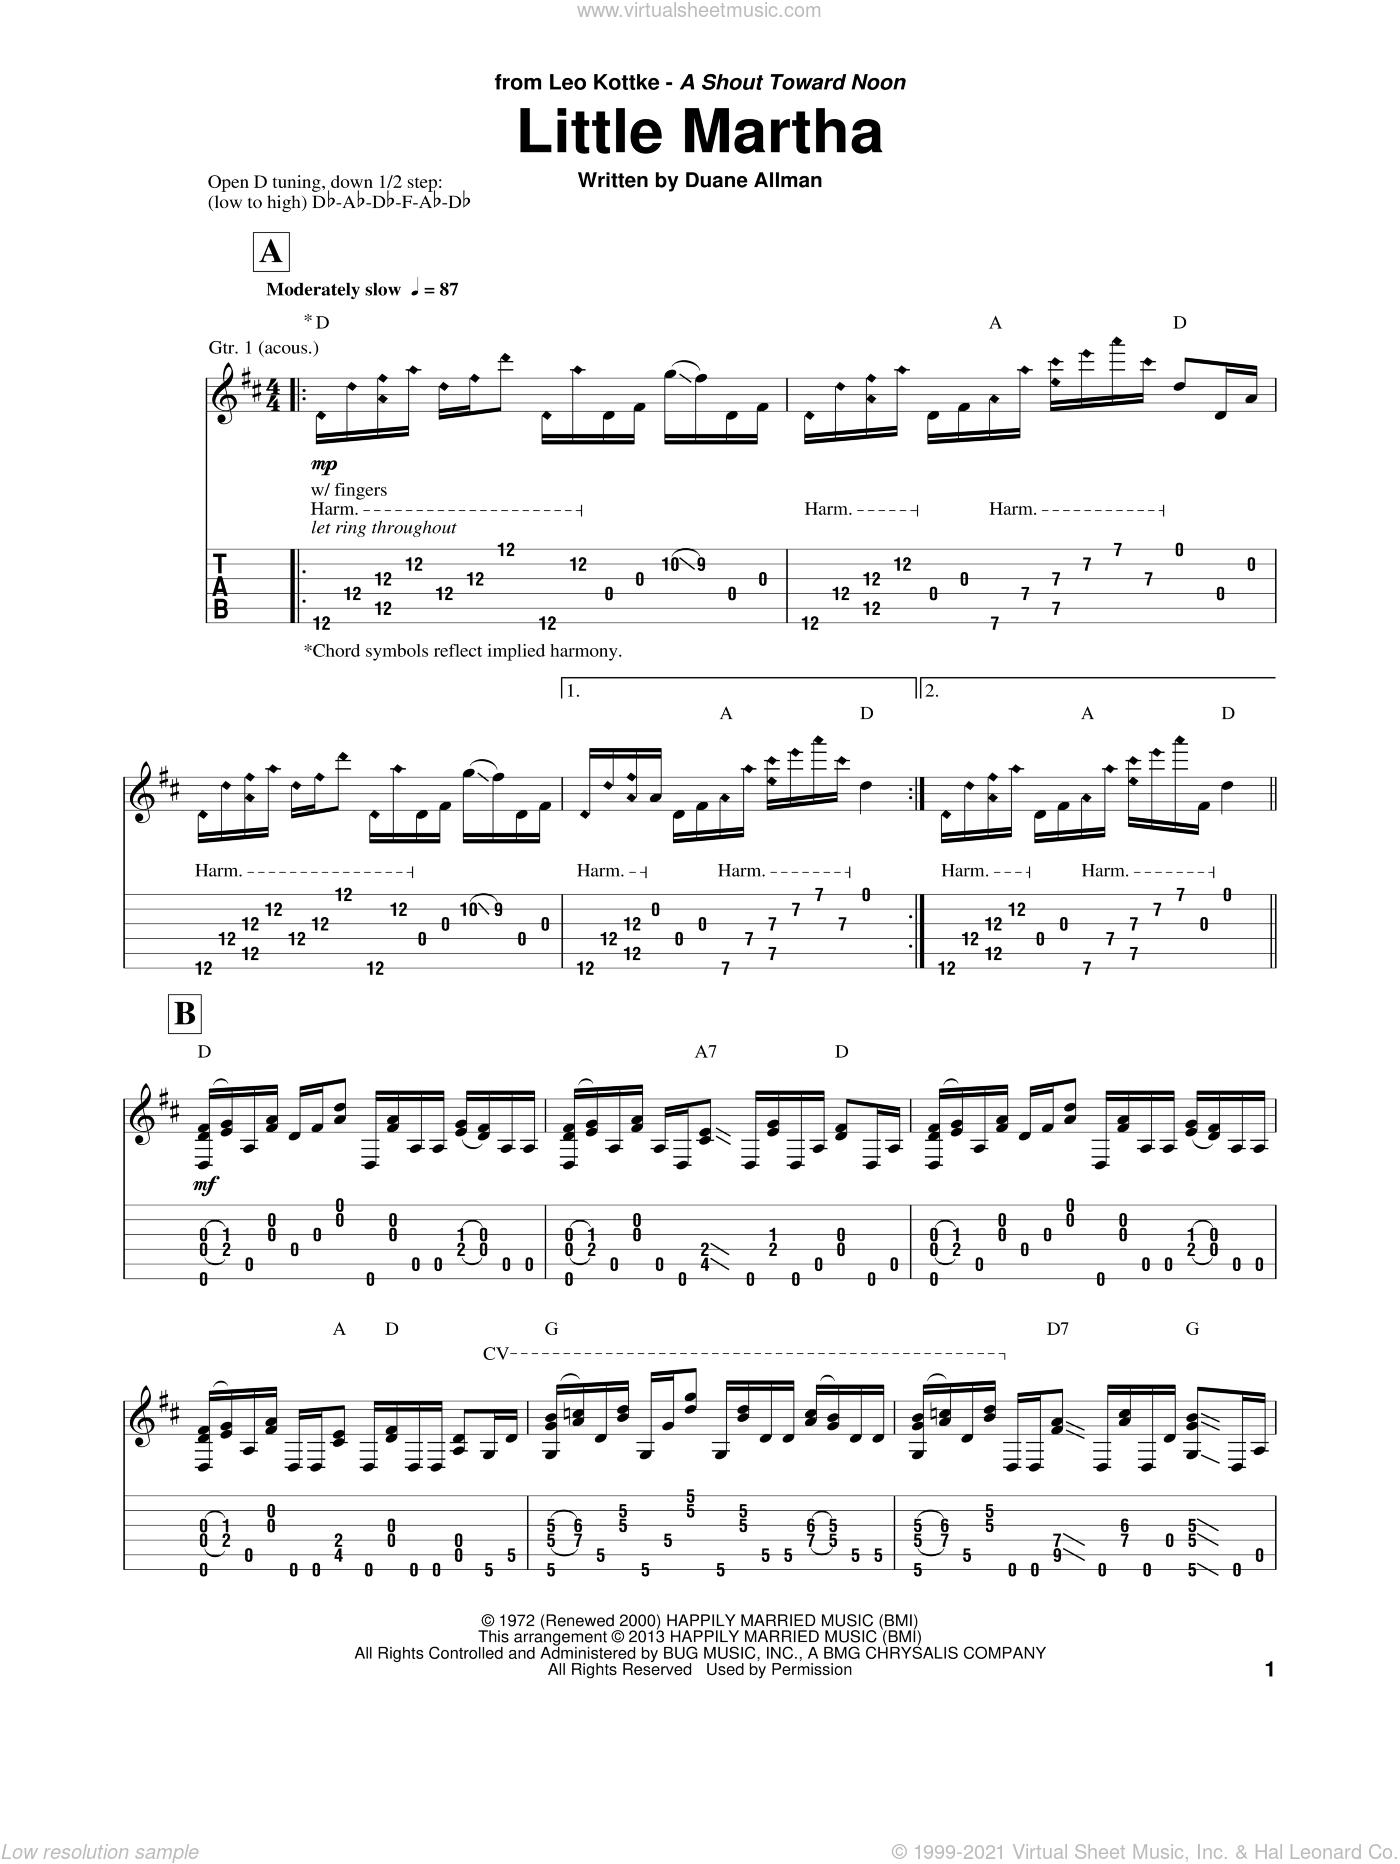 Little Martha sheet music for guitar solo by Duane Allman and Leo Kottke, intermediate skill level